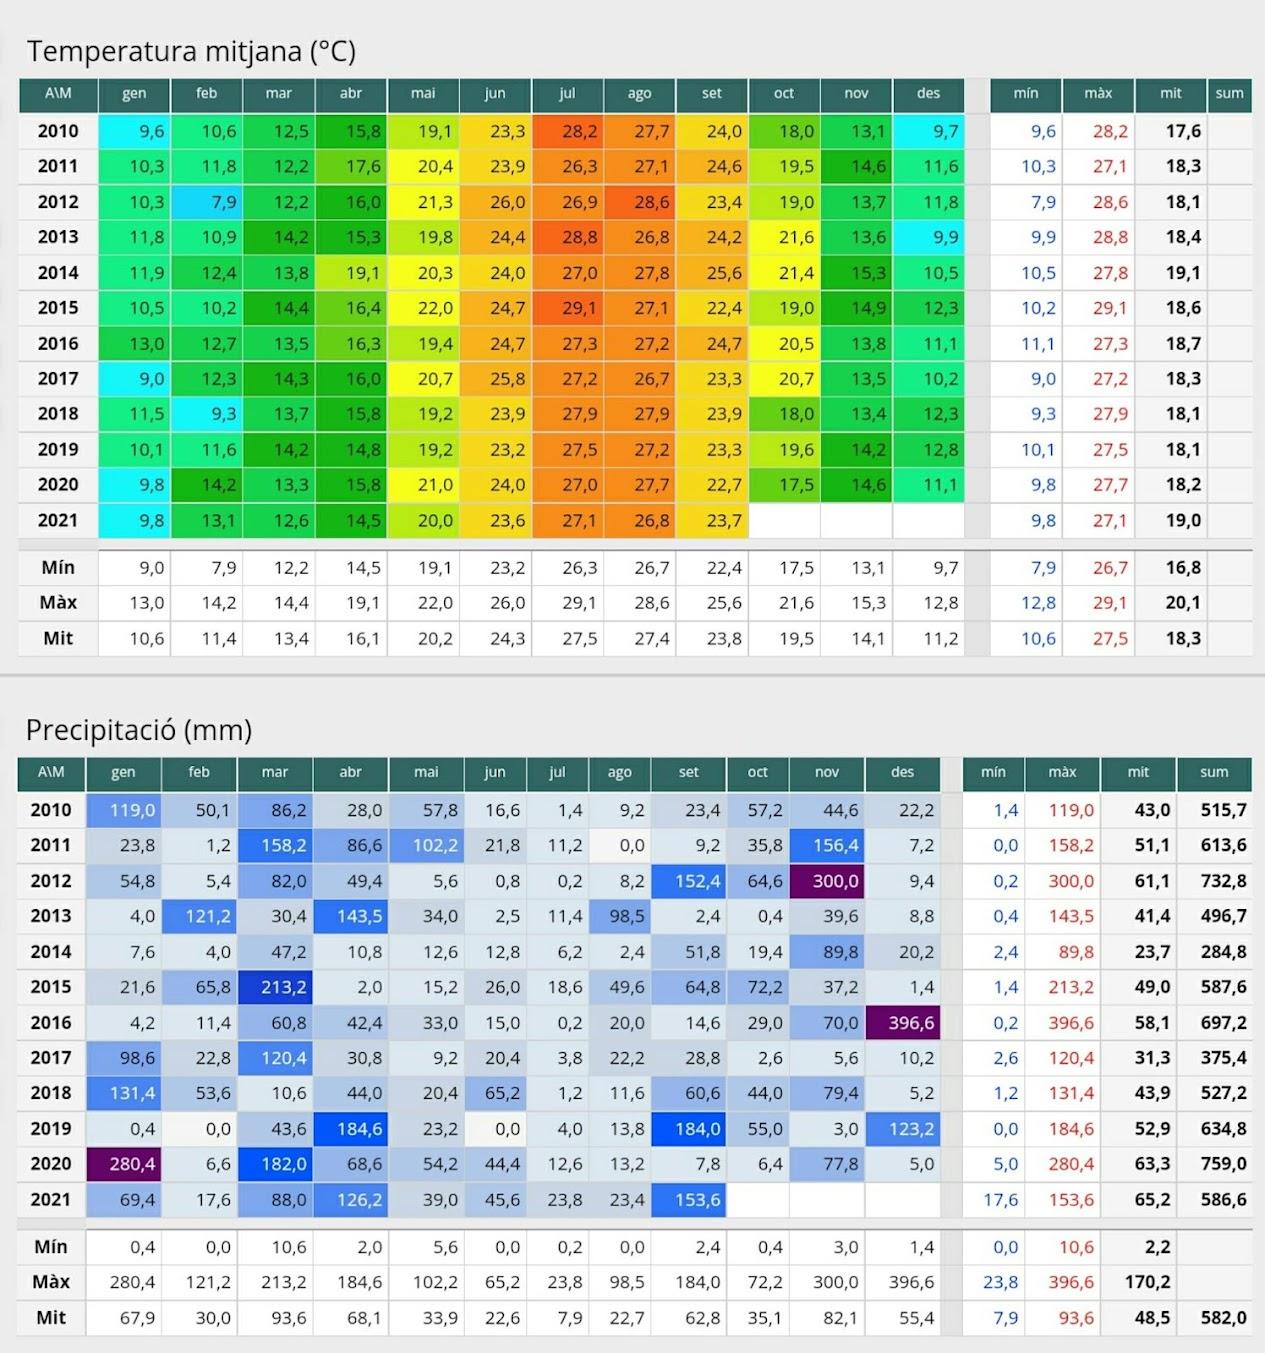 Climatológicos. Periodo 2010-2021.